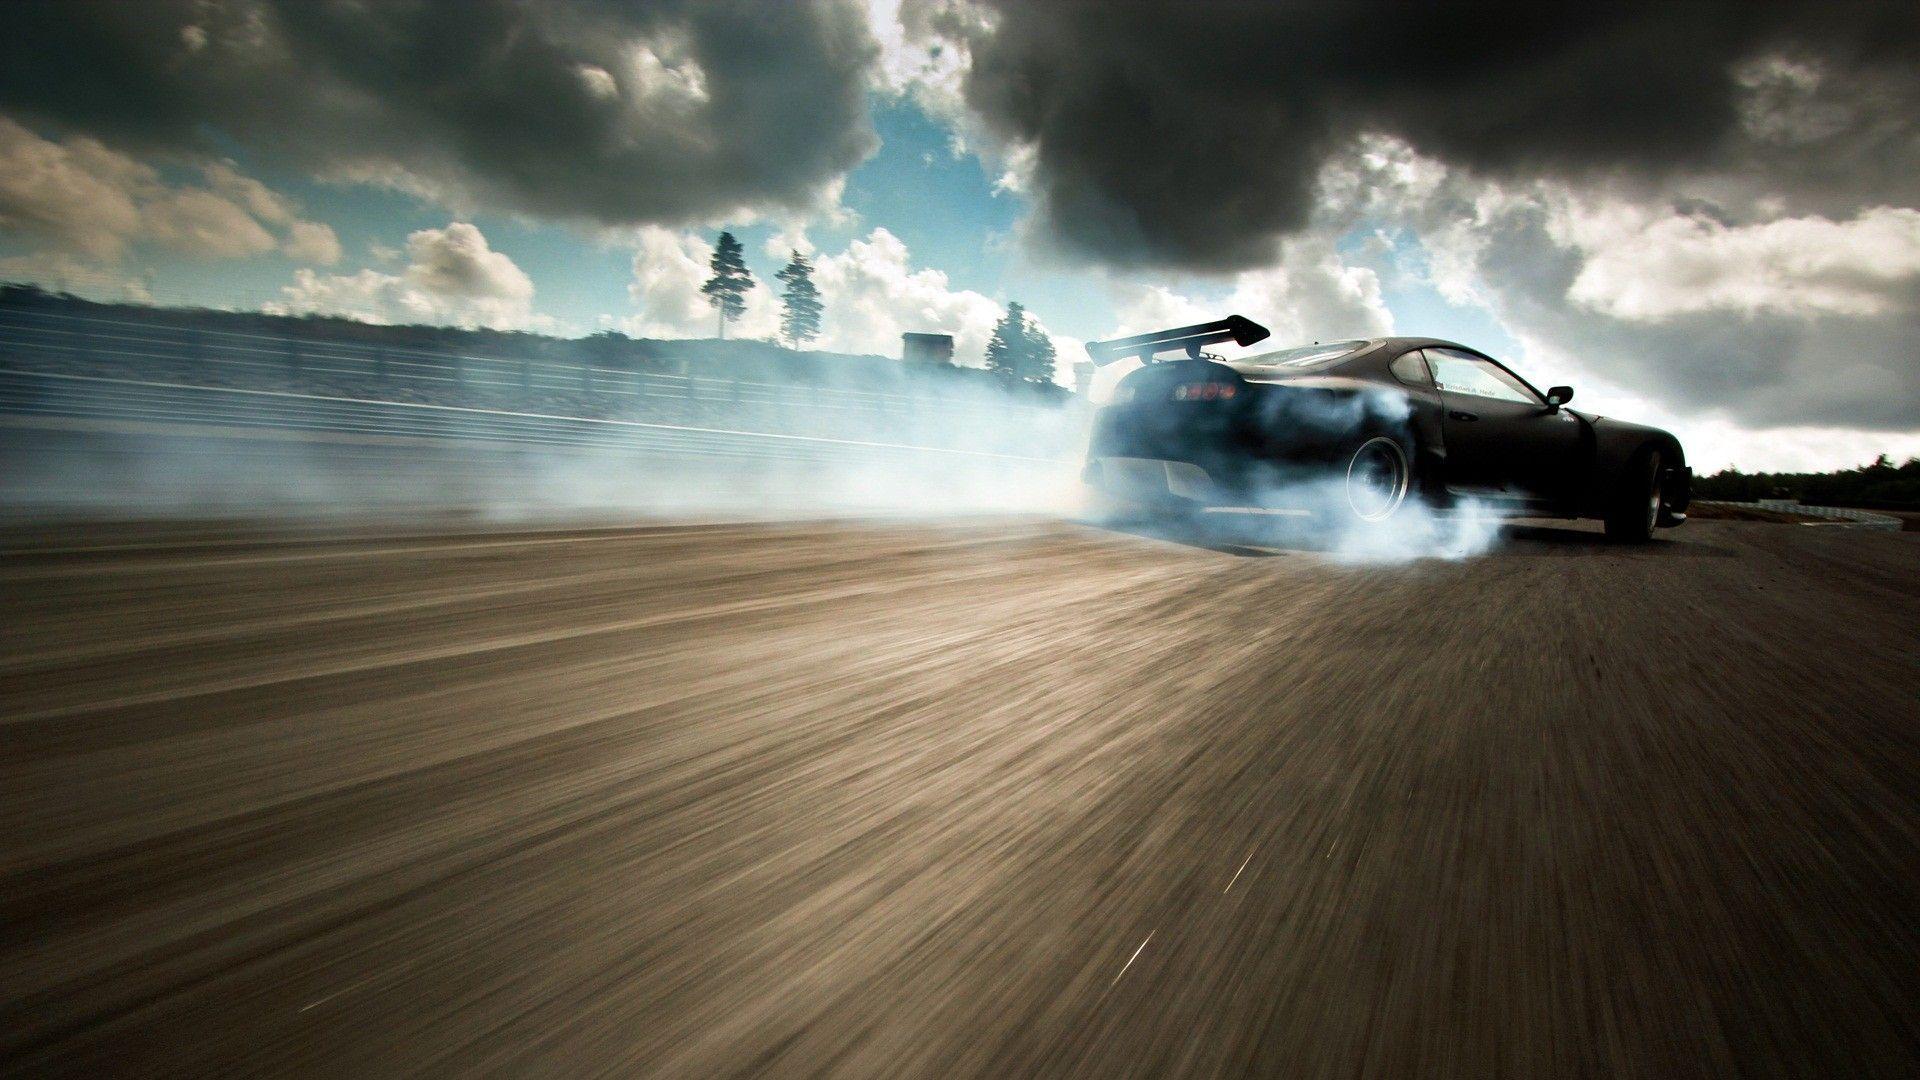 Drift Cars Hd Wallpapers Top Free Drift Cars Hd Backgrounds